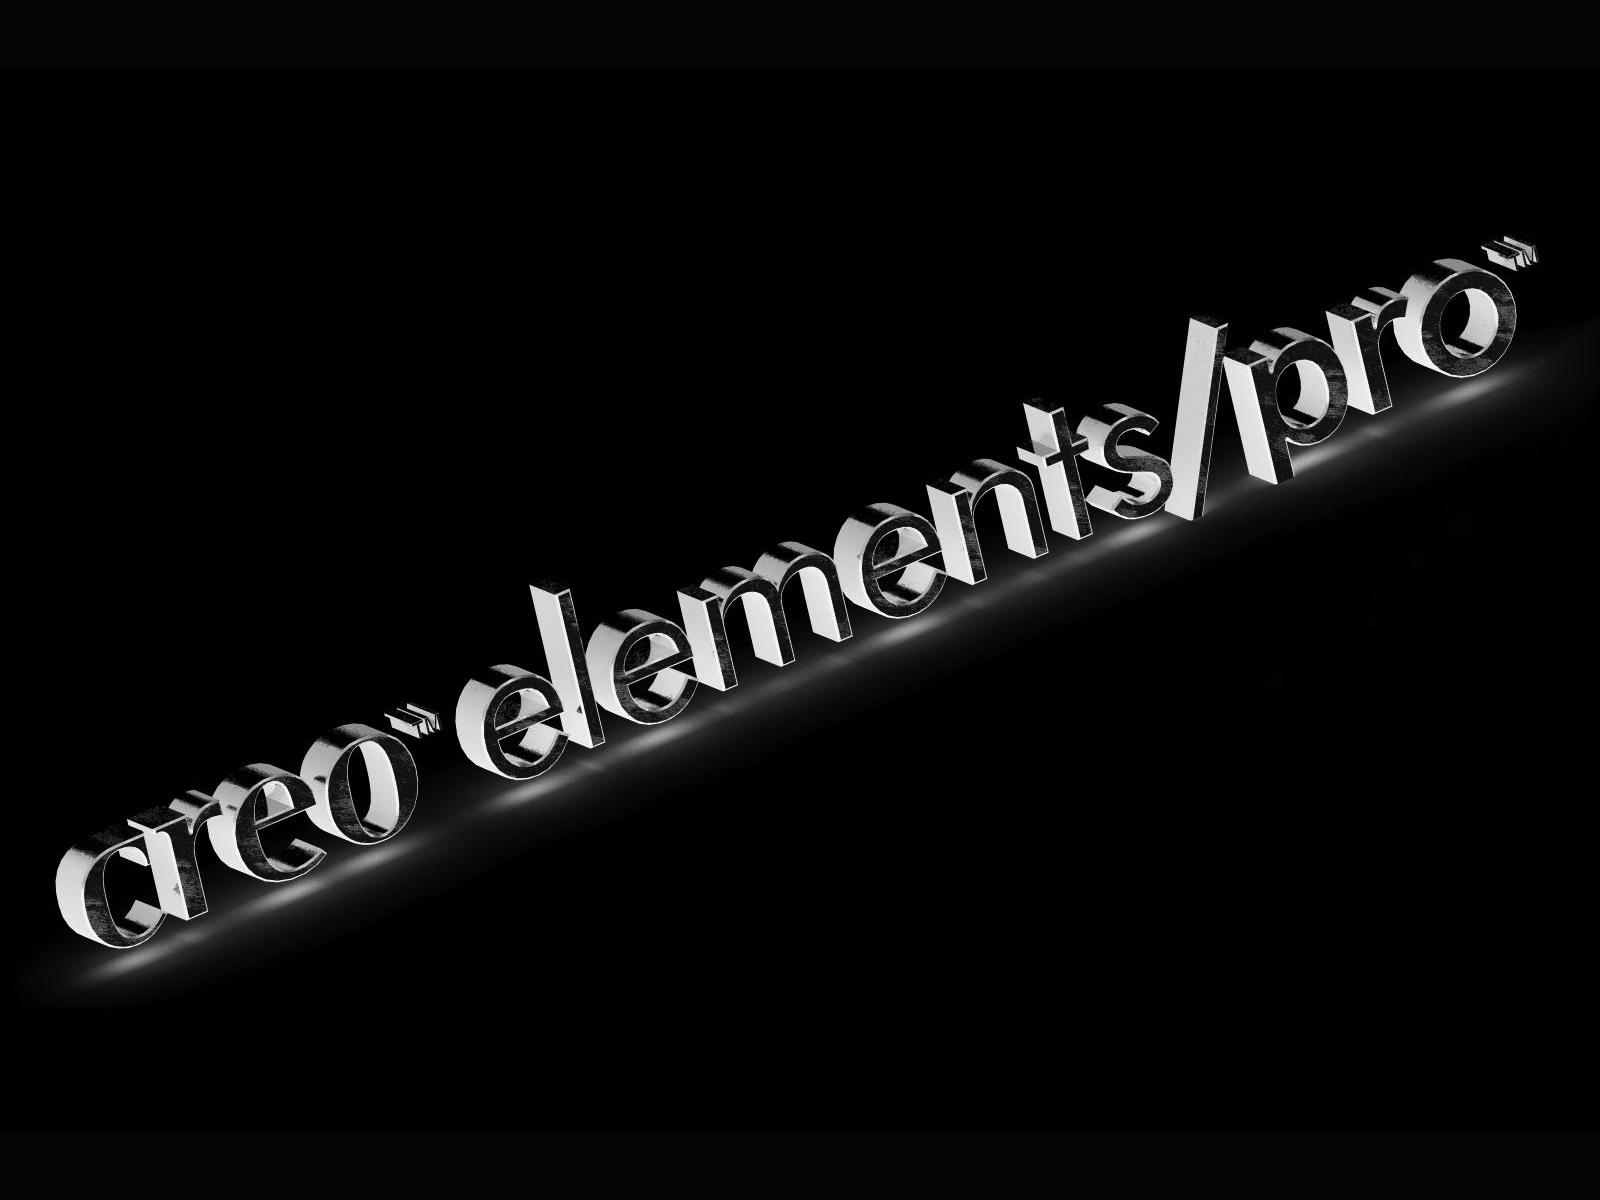 proe2creo_creo-black_1600x1200.jpg